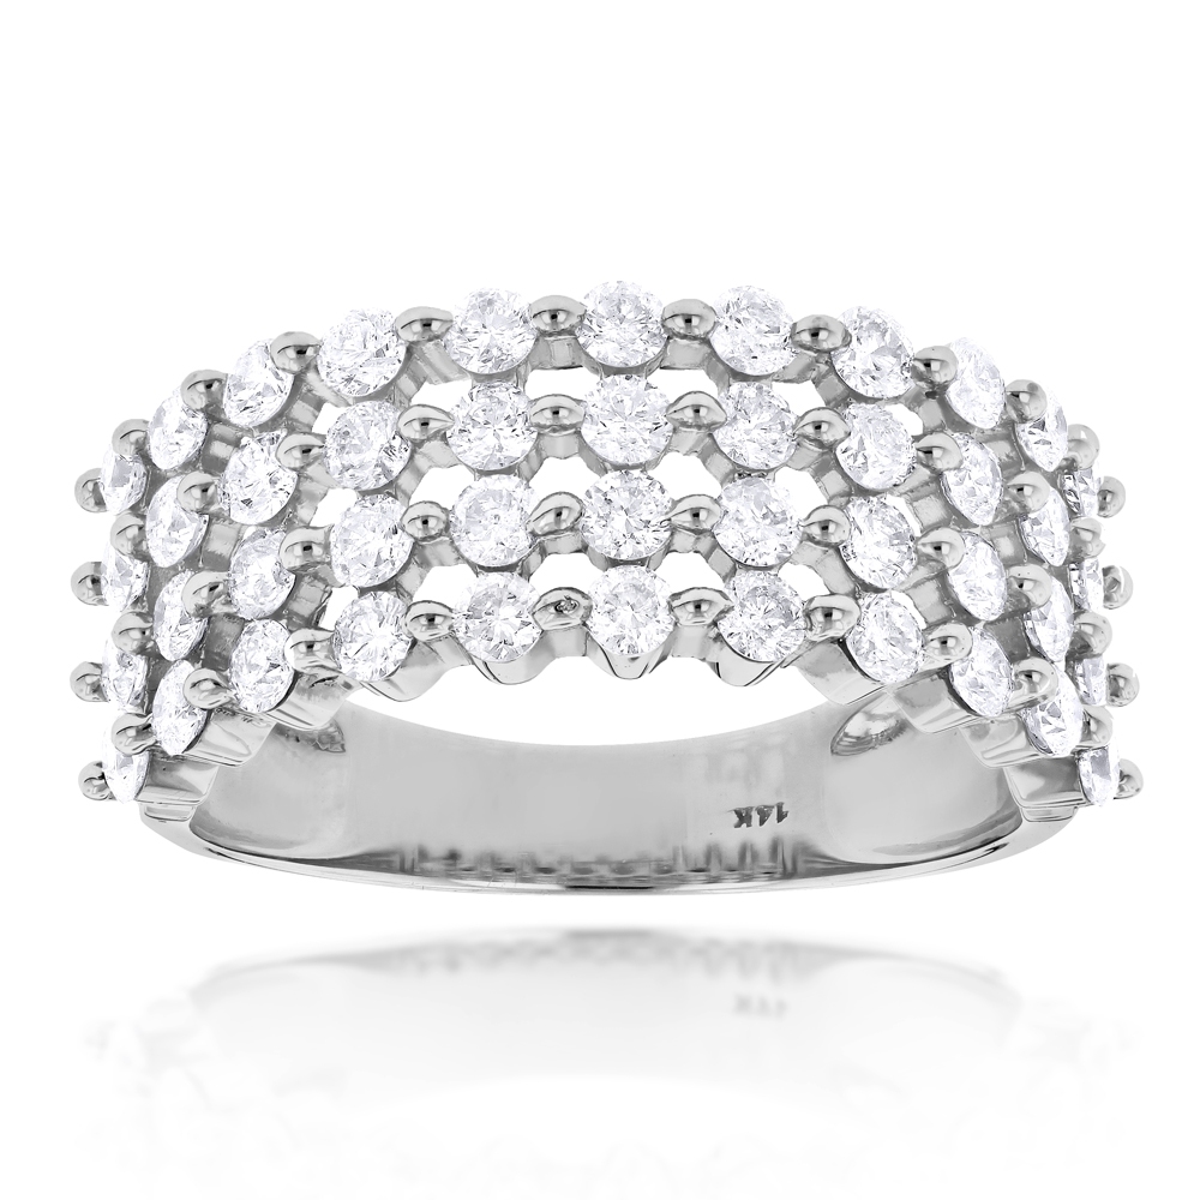 Designer 4 Row Diamond Wedding Band 1.42ct 14K Gold